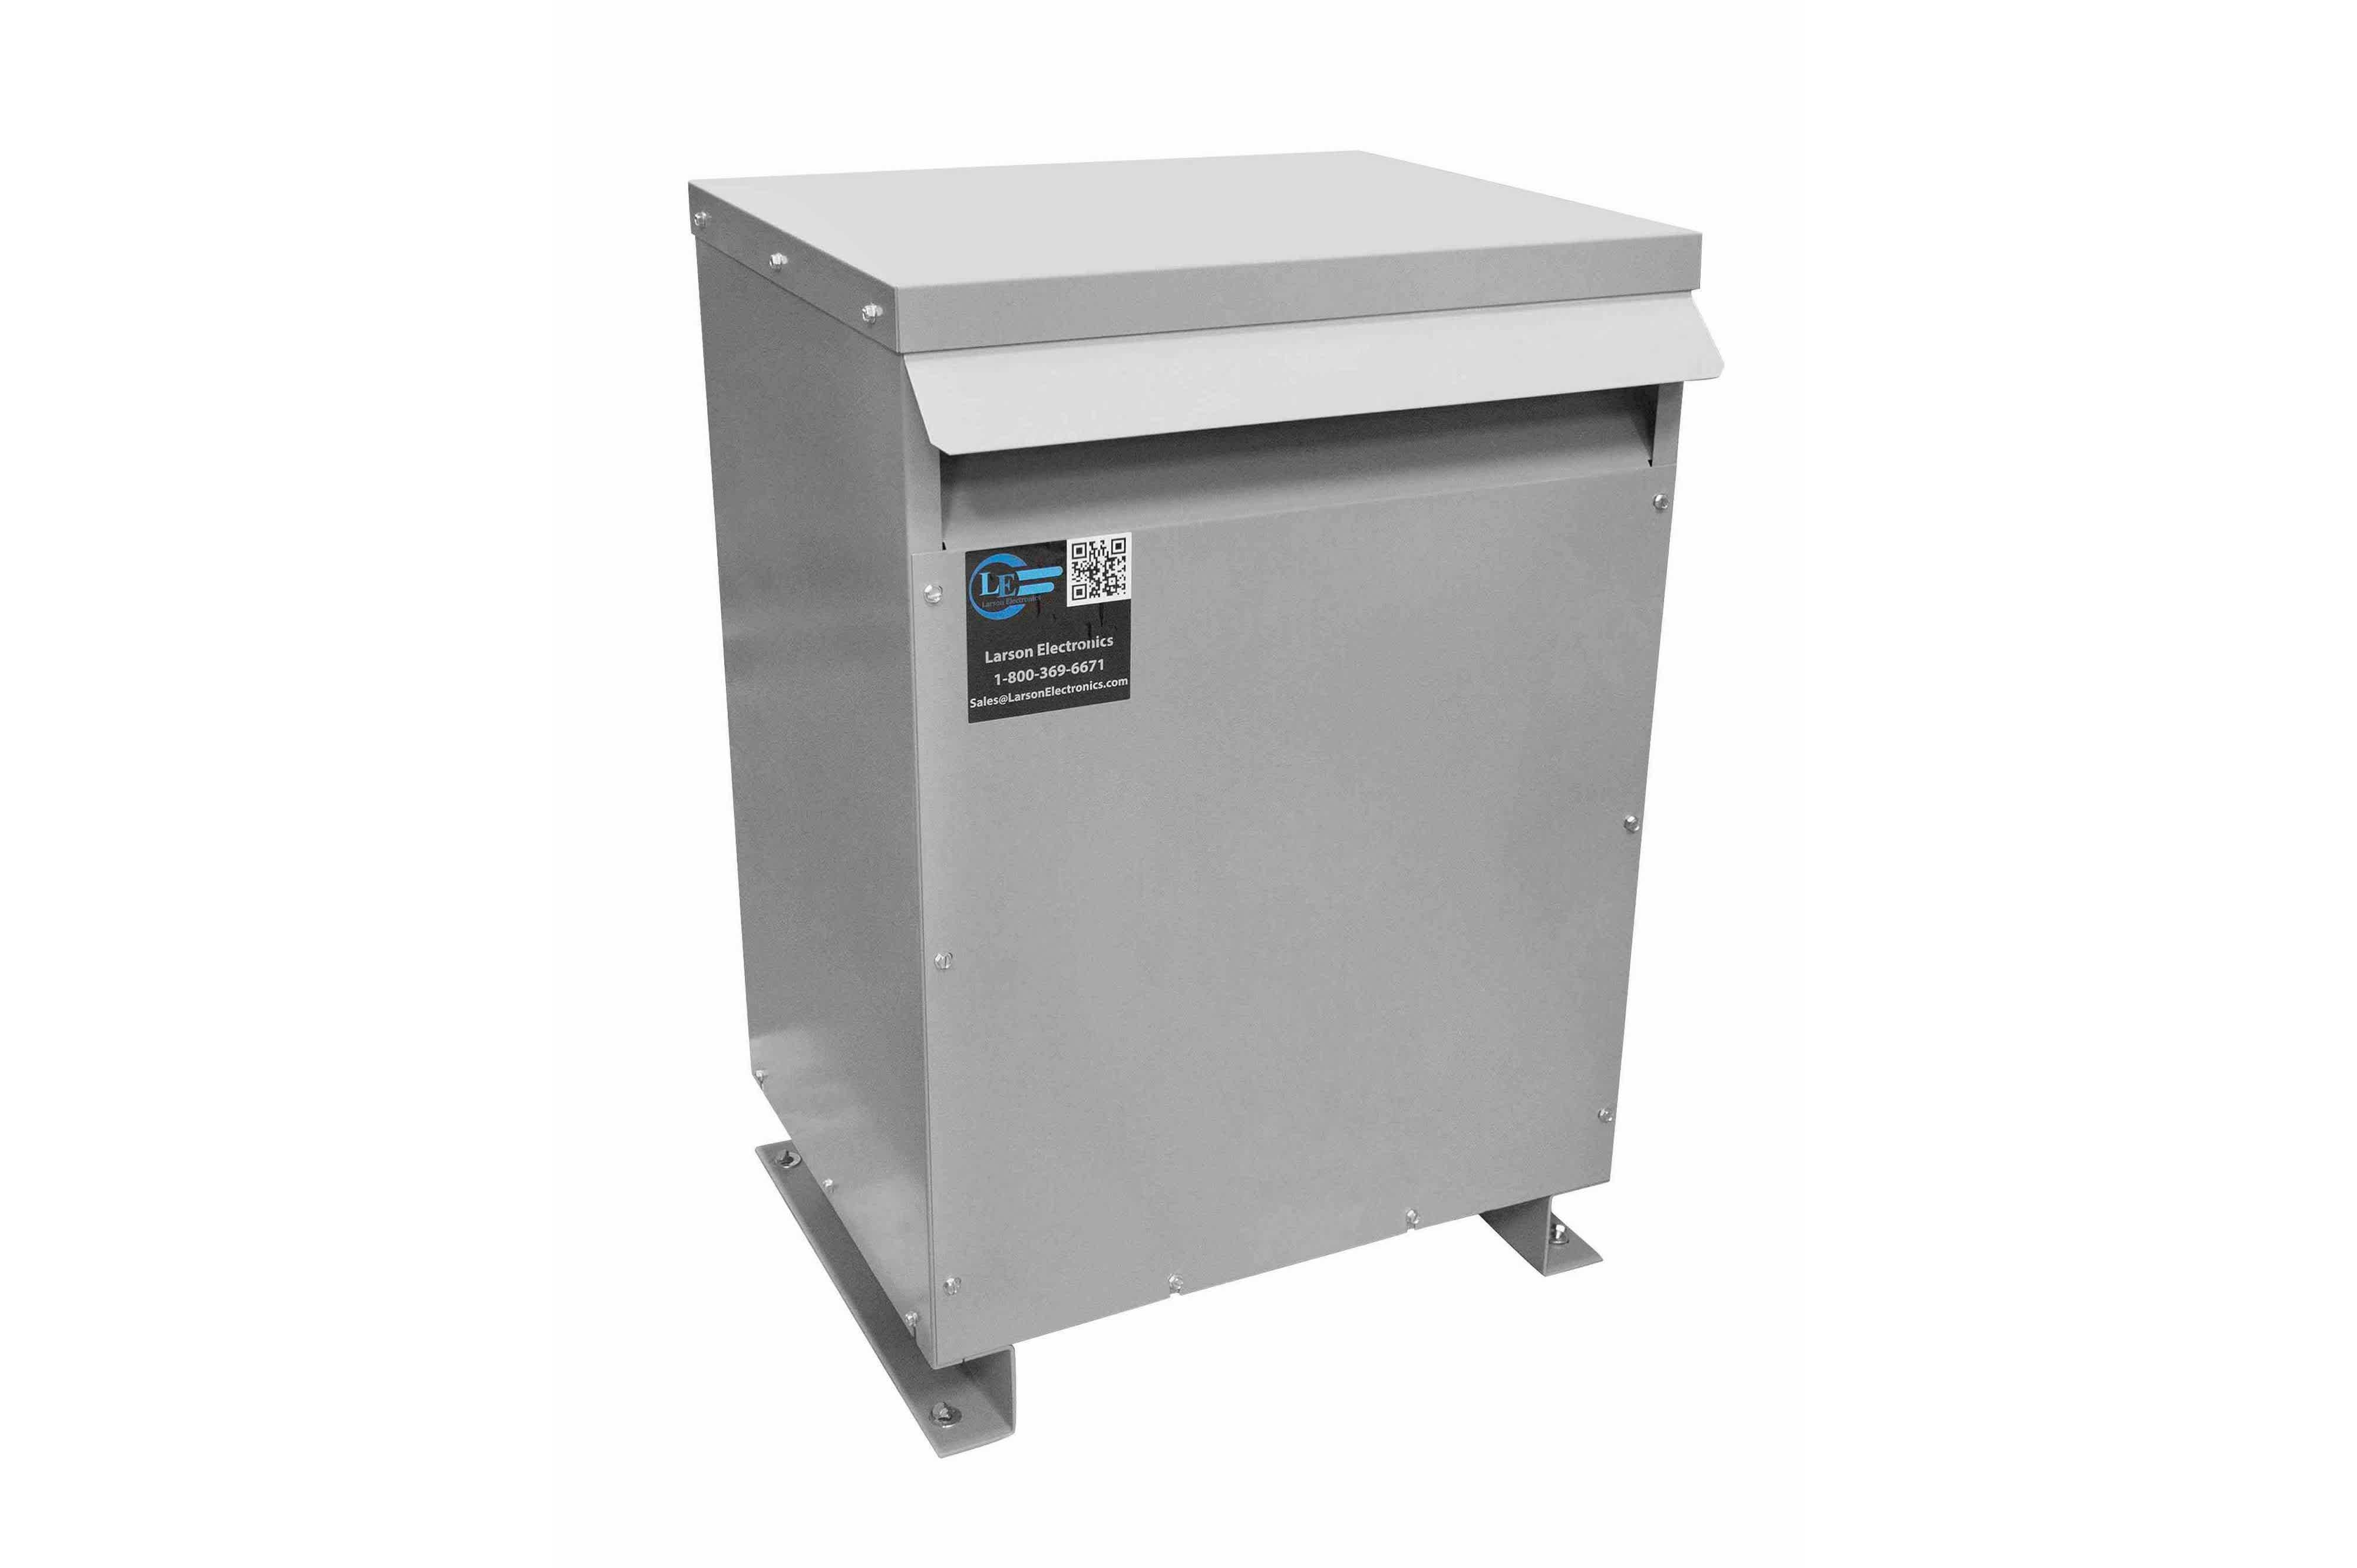 300 kVA 3PH DOE Transformer, 480V Delta Primary, 600Y/347 Wye-N Secondary, N3R, Ventilated, 60 Hz